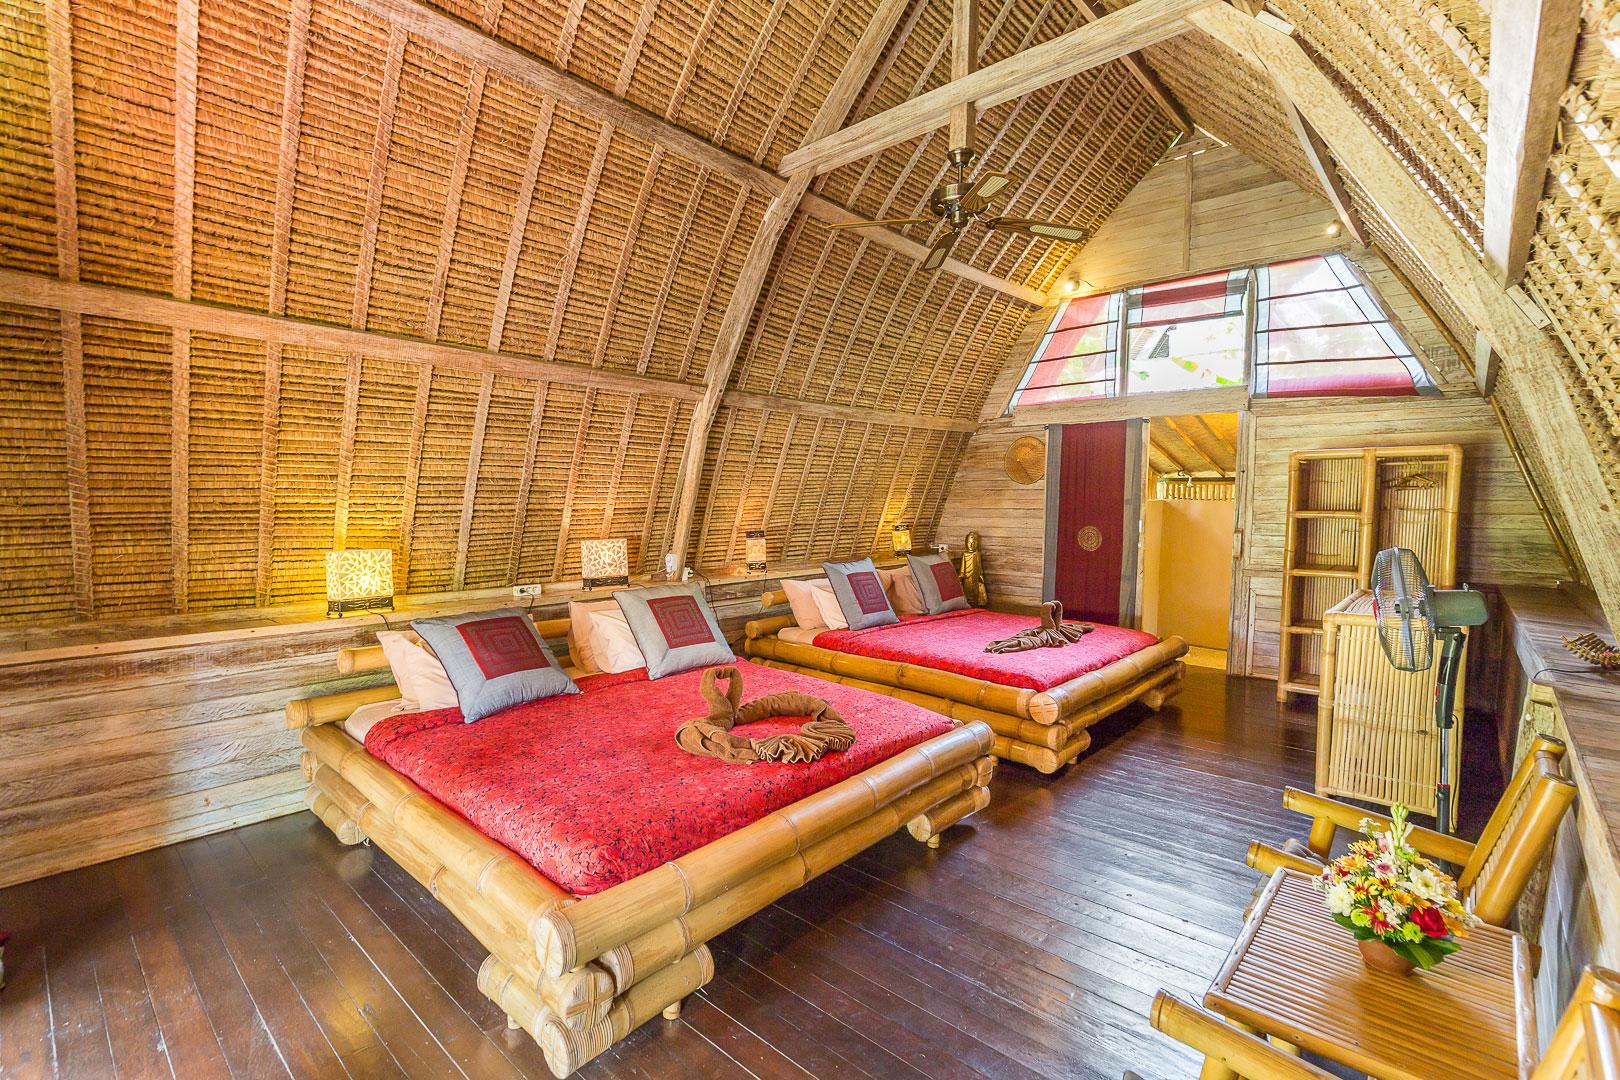 Location-bungalows-maison-hote-hotel-milos-home-L7-rhodochrosite-6